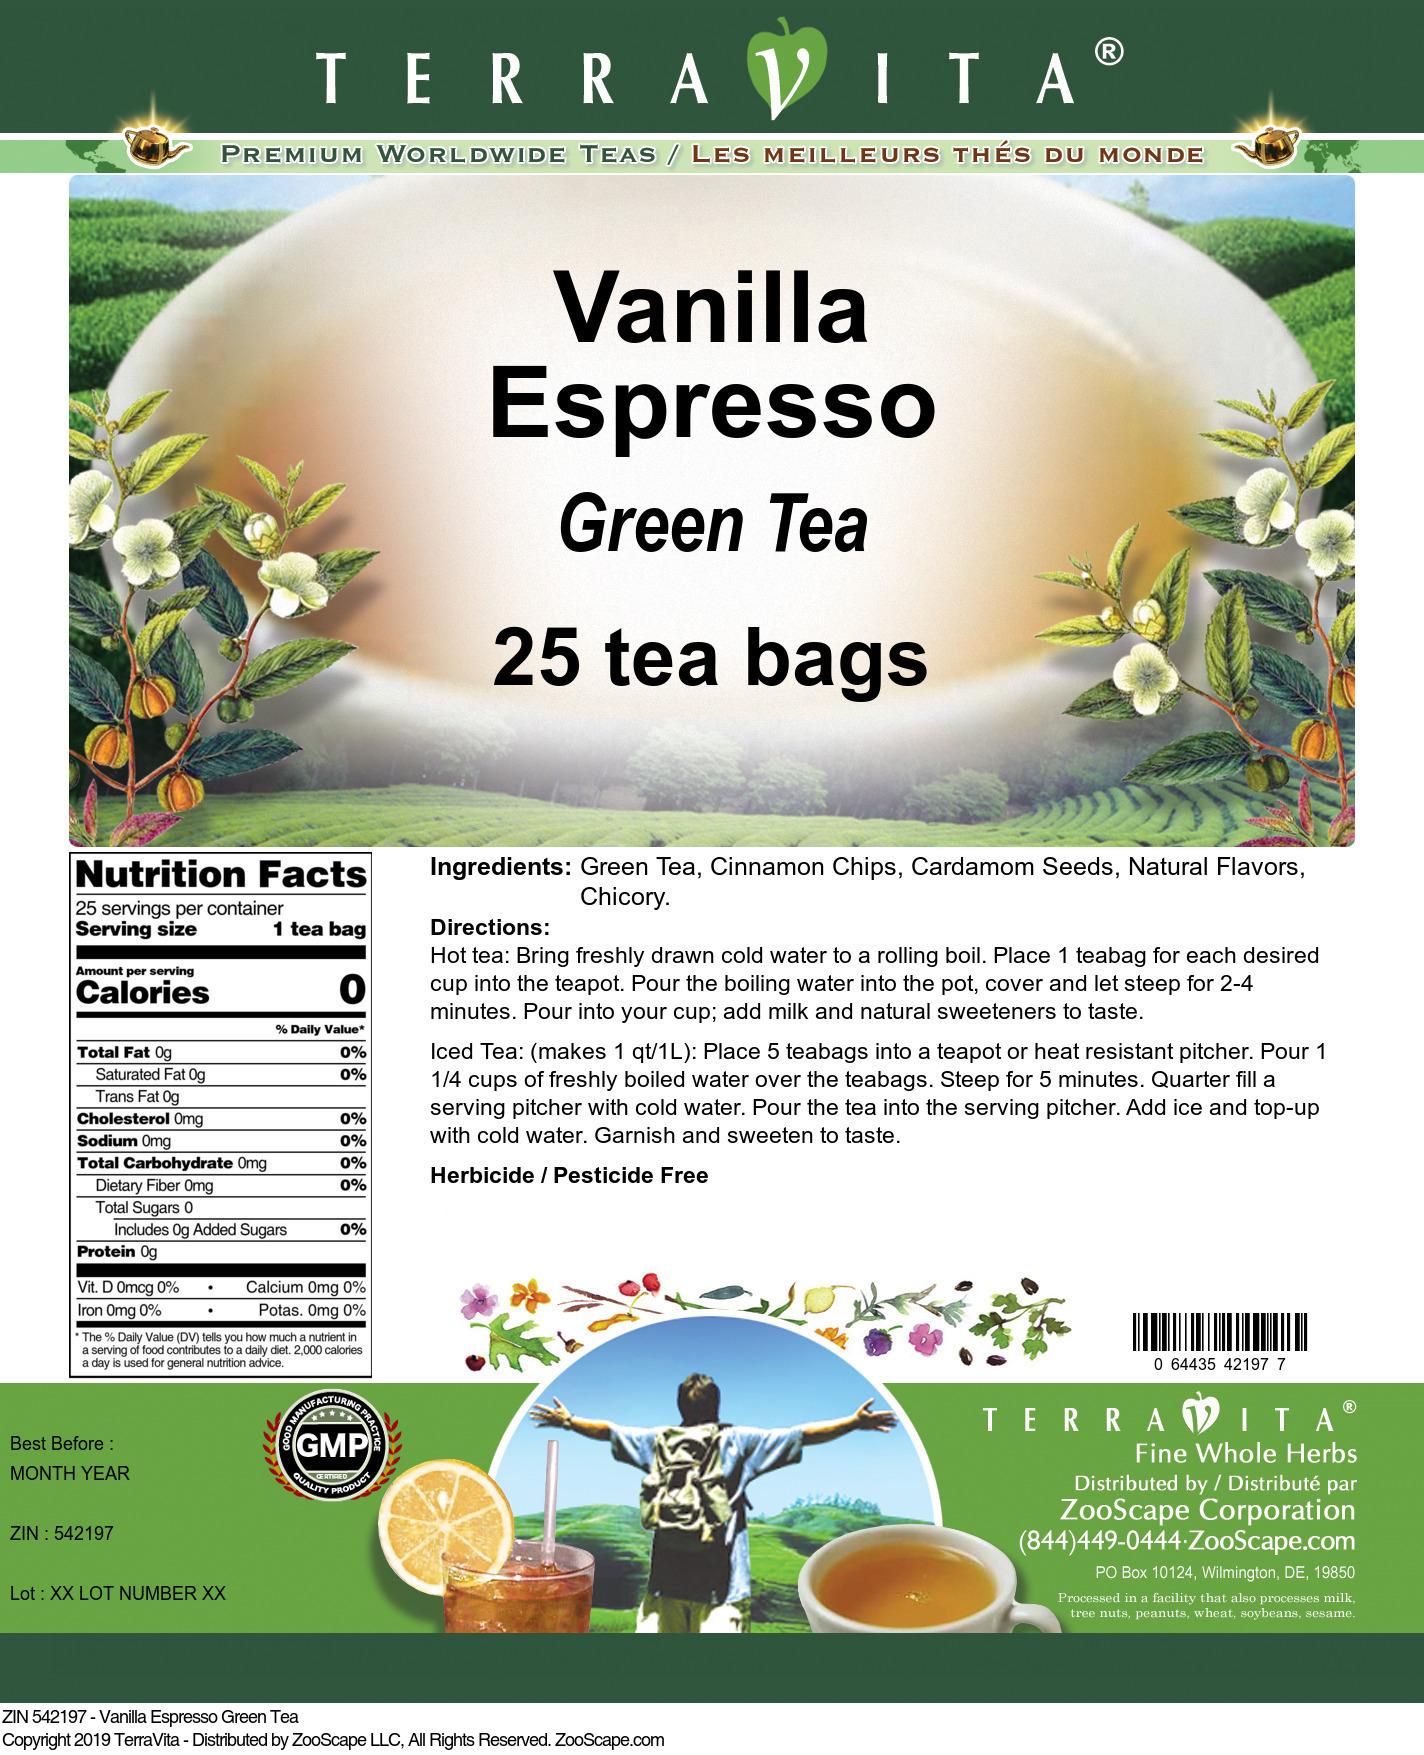 Vanilla Espresso Green Tea